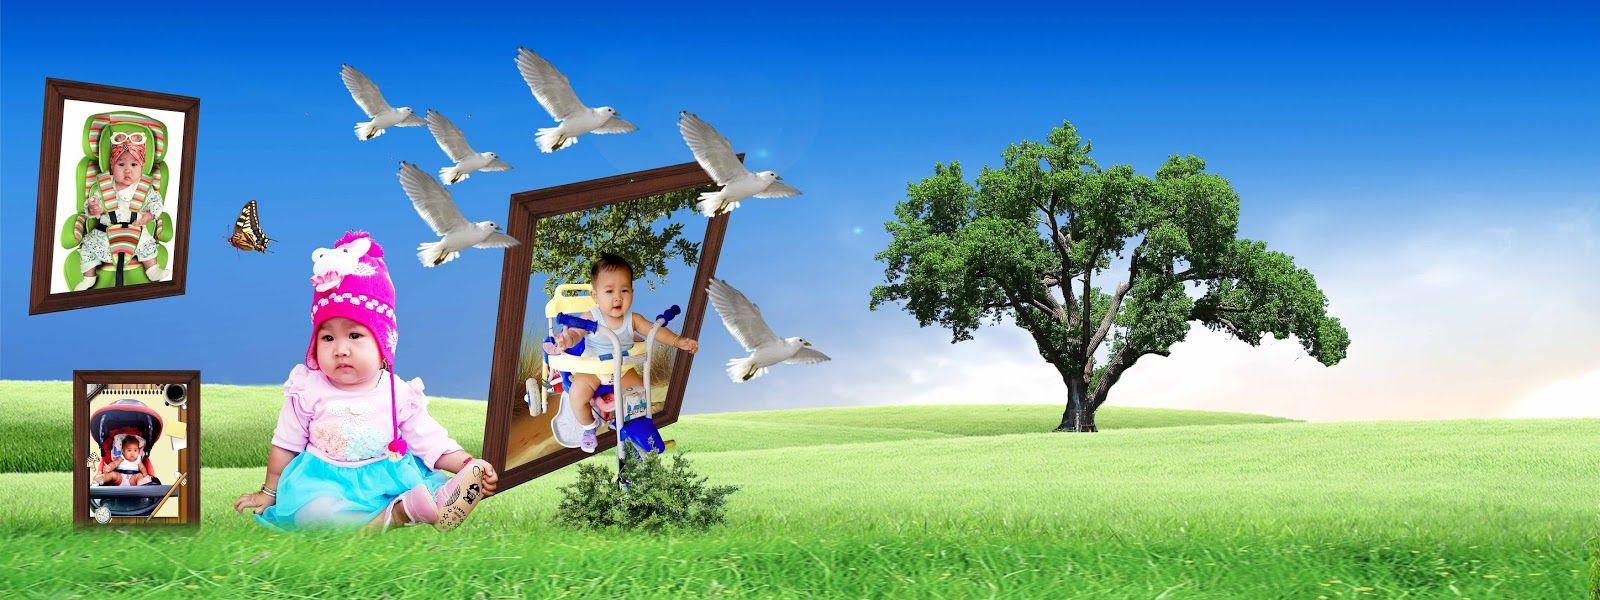 JASA EDIT FOTO | Anak